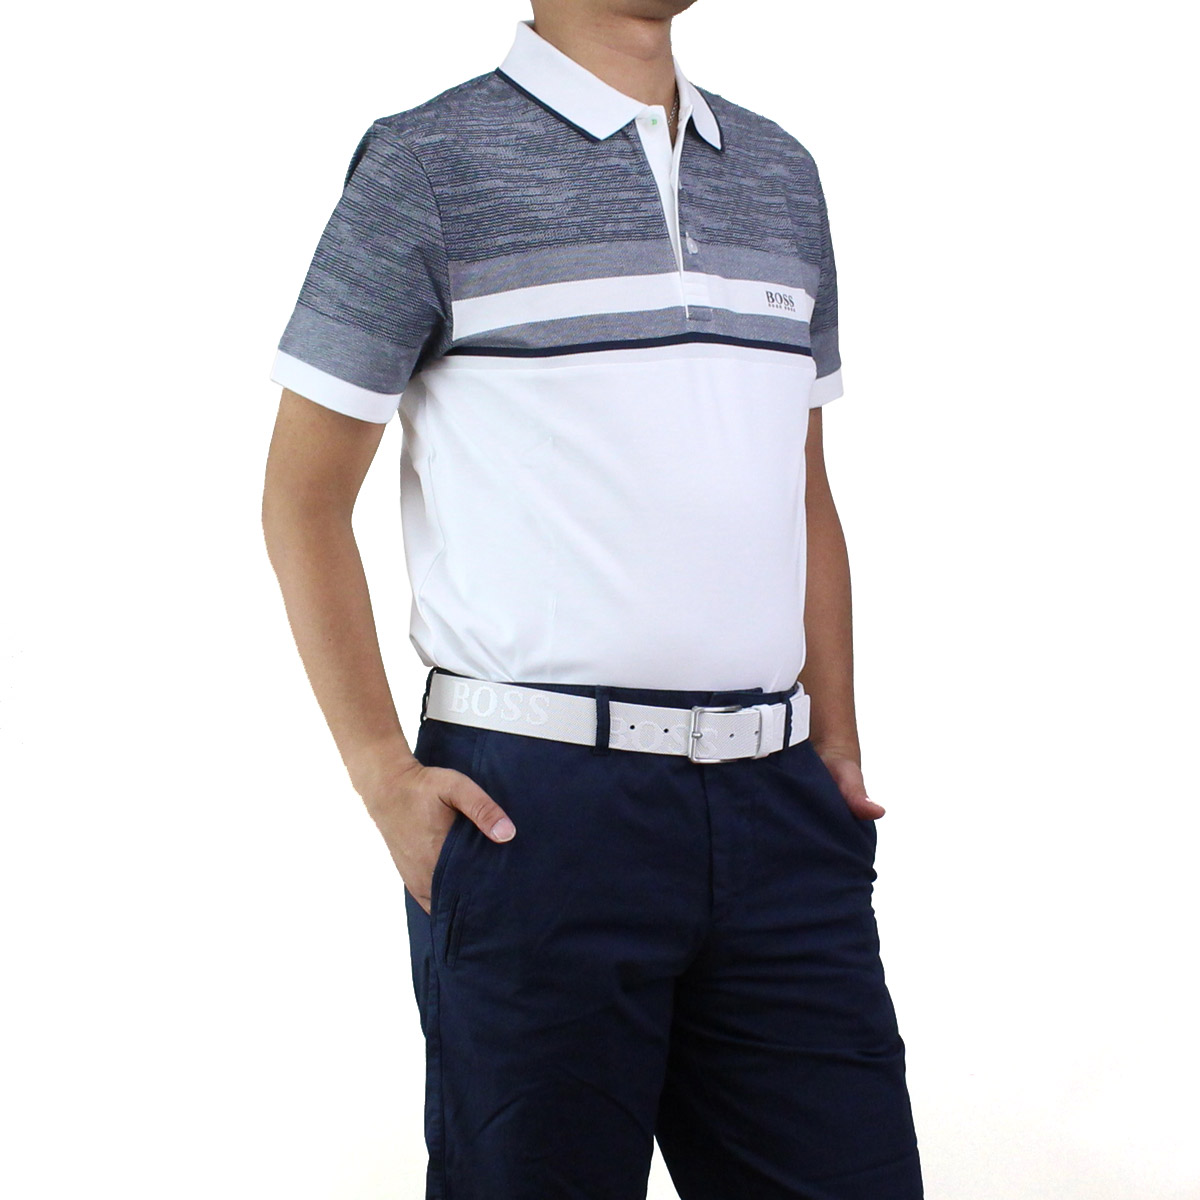 0b0ece947 Bighit The total brand wholesale: Hugo Boss HUGO BOSS PAULE 5 poles 5 polo  shirt short sleeves golf wear 50404265 10215735 100 white system gray  system men ...